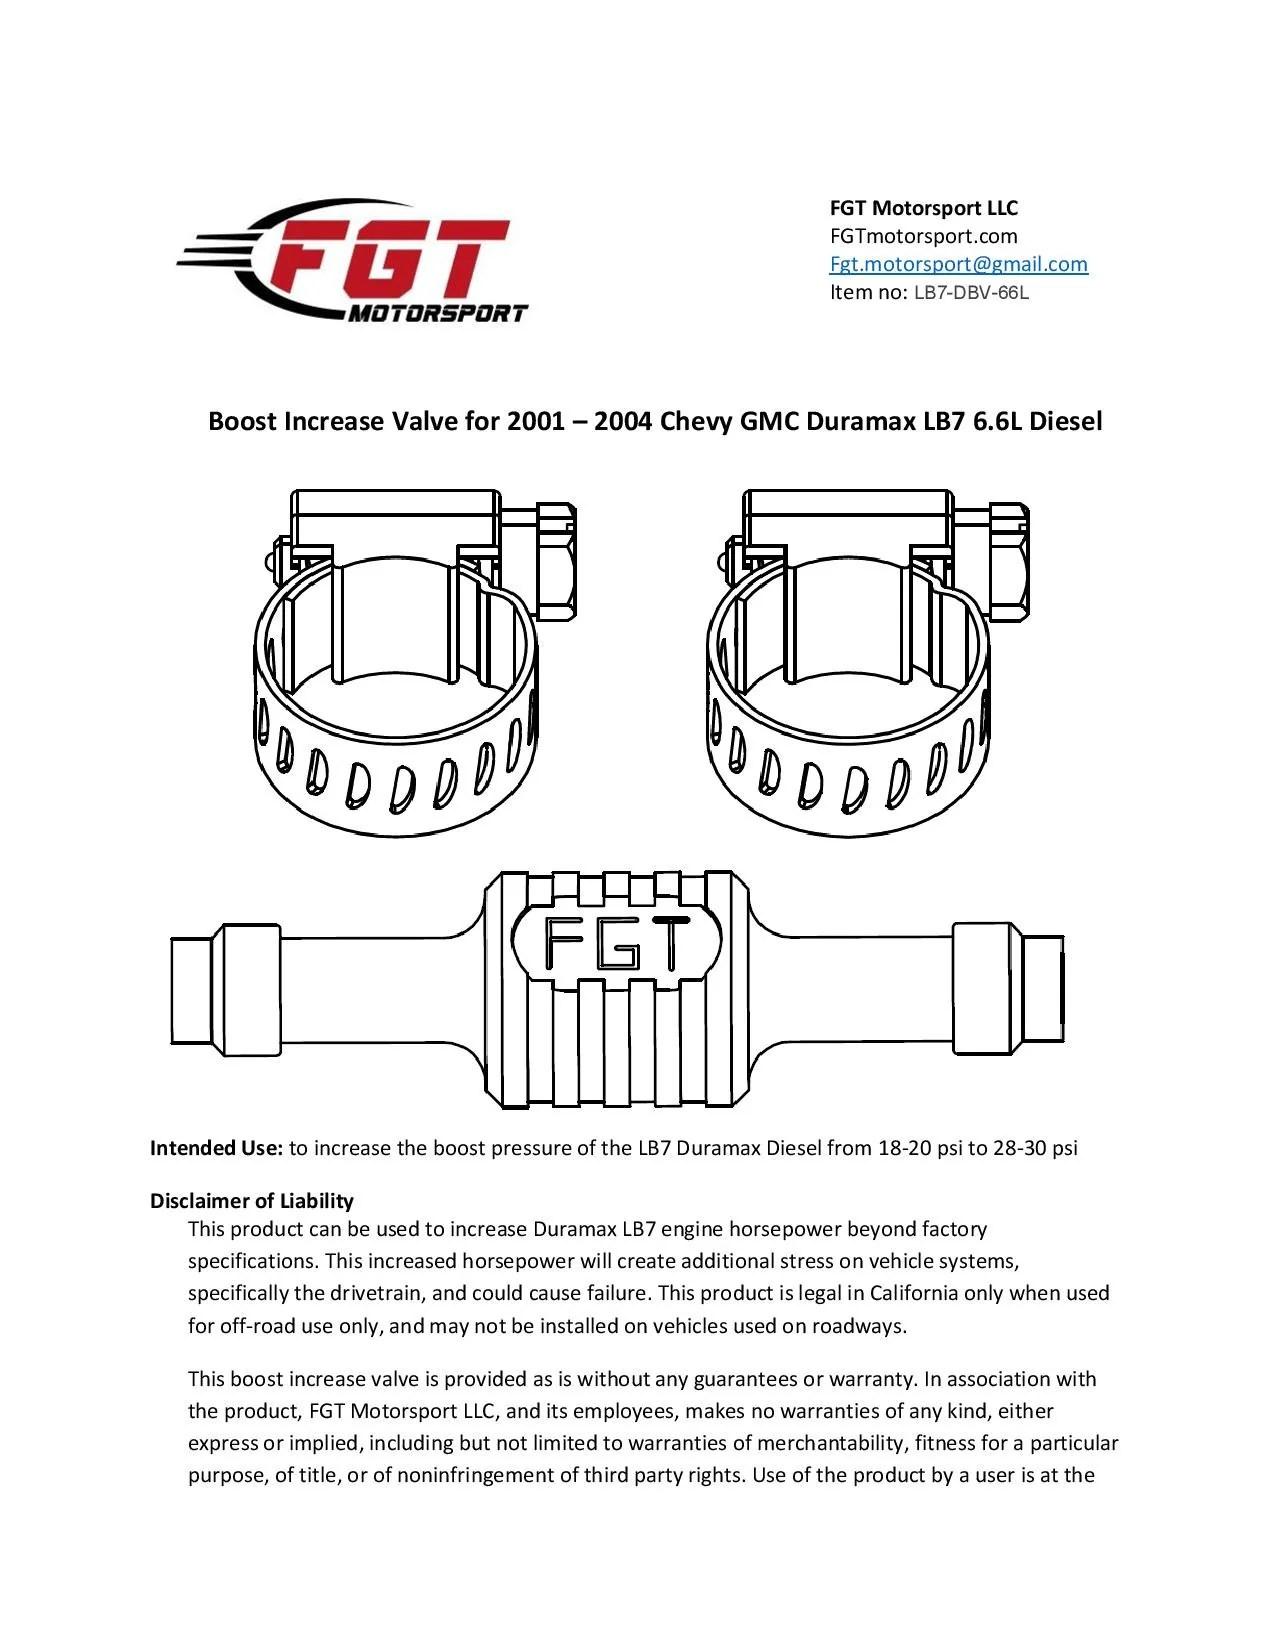 small resolution of boost increase valve for 01 04 duramax 6 6l lb7 chevy silverado